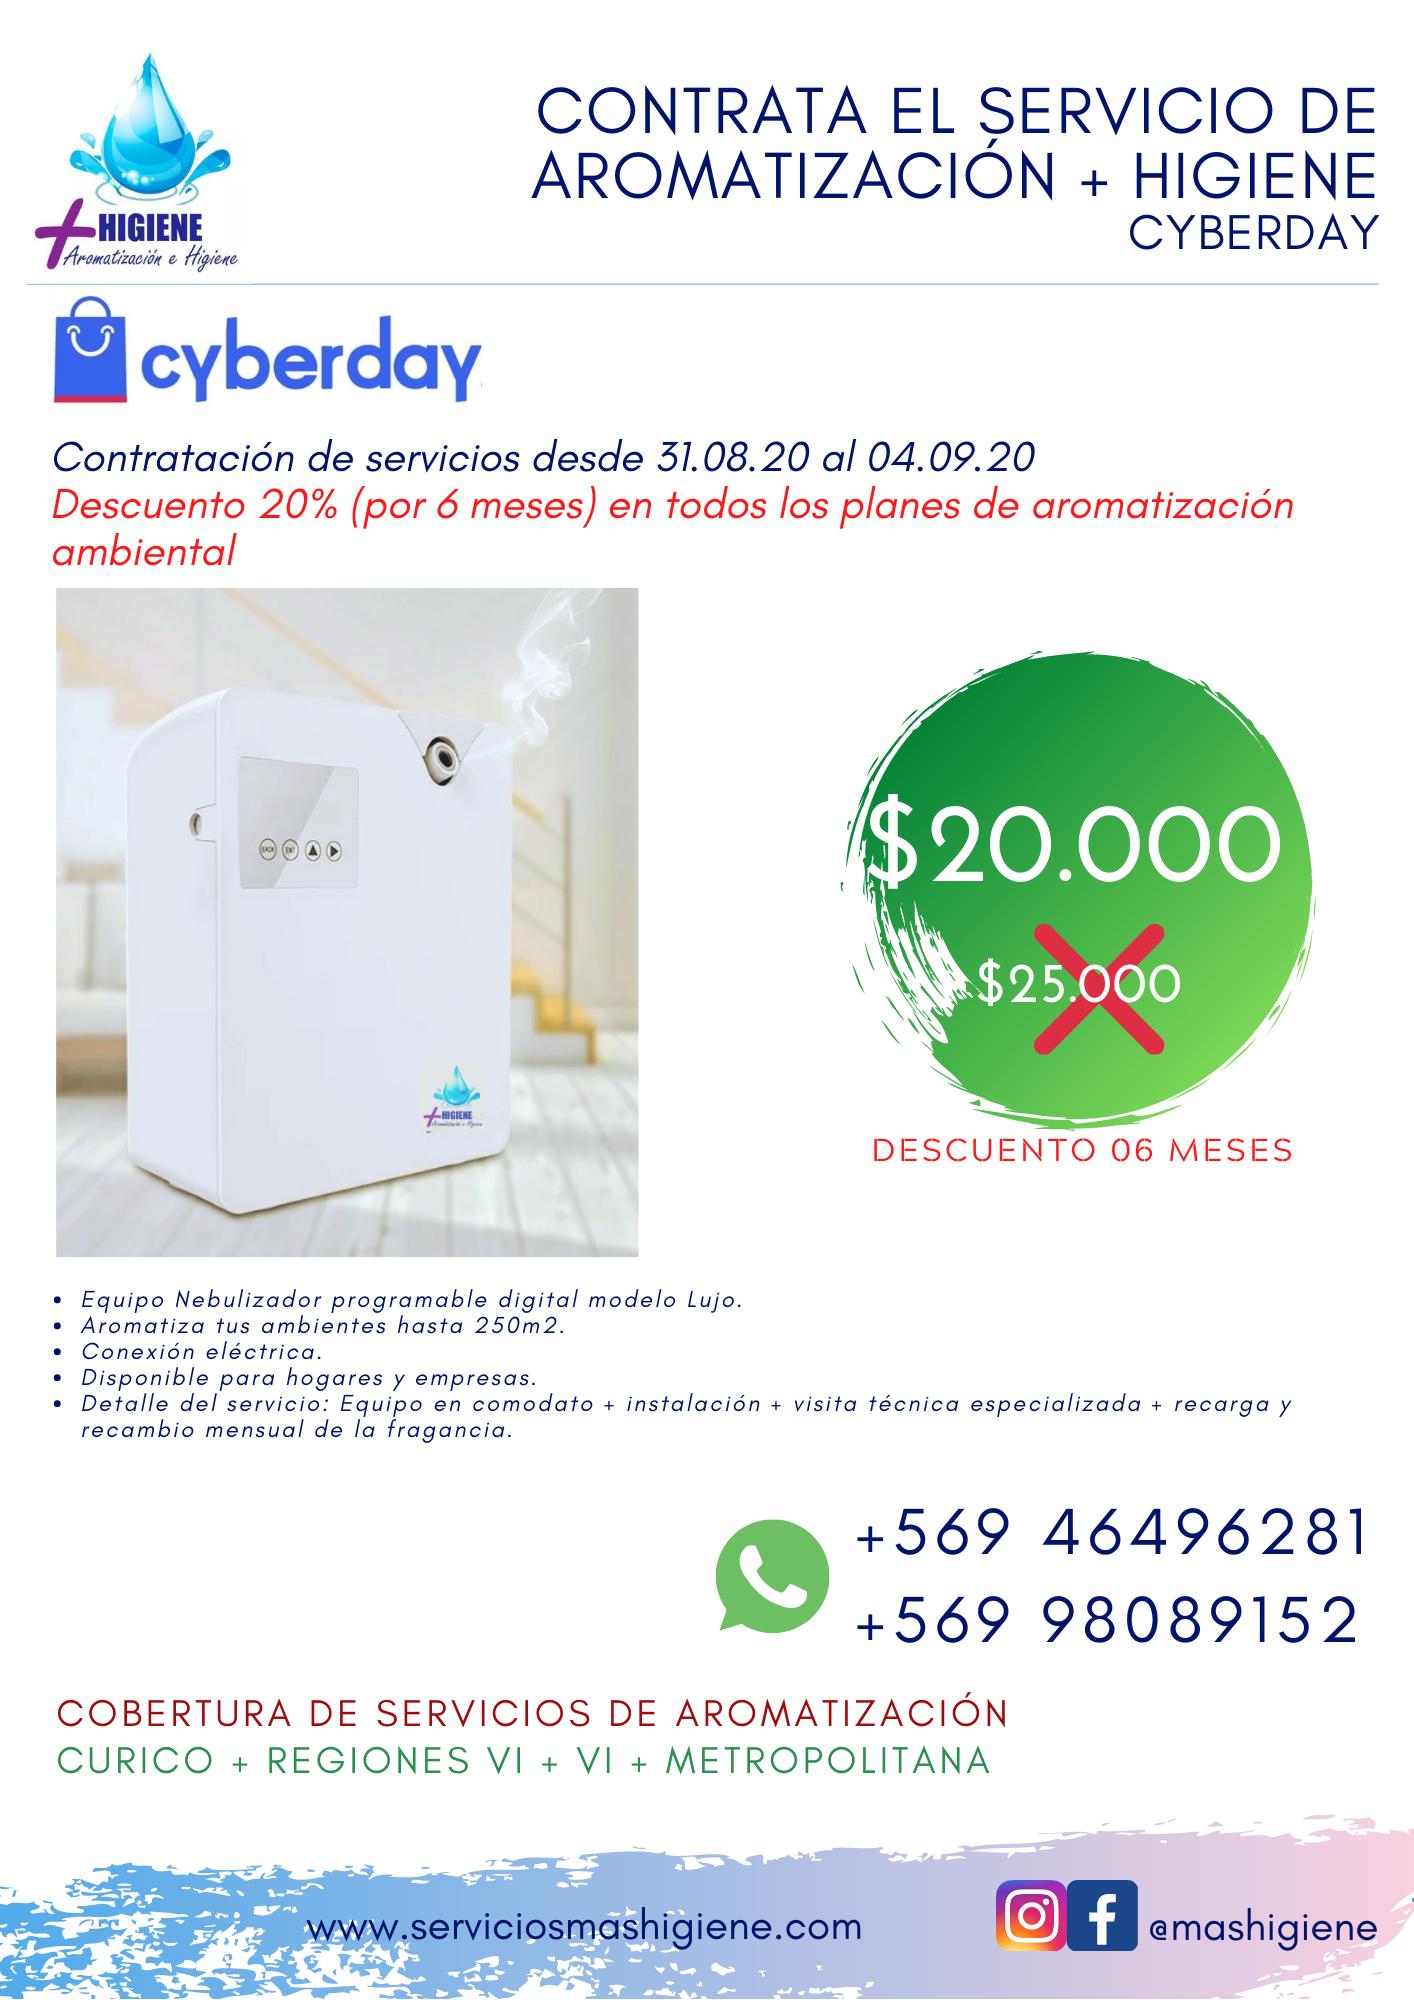 Nebulizador Cyber